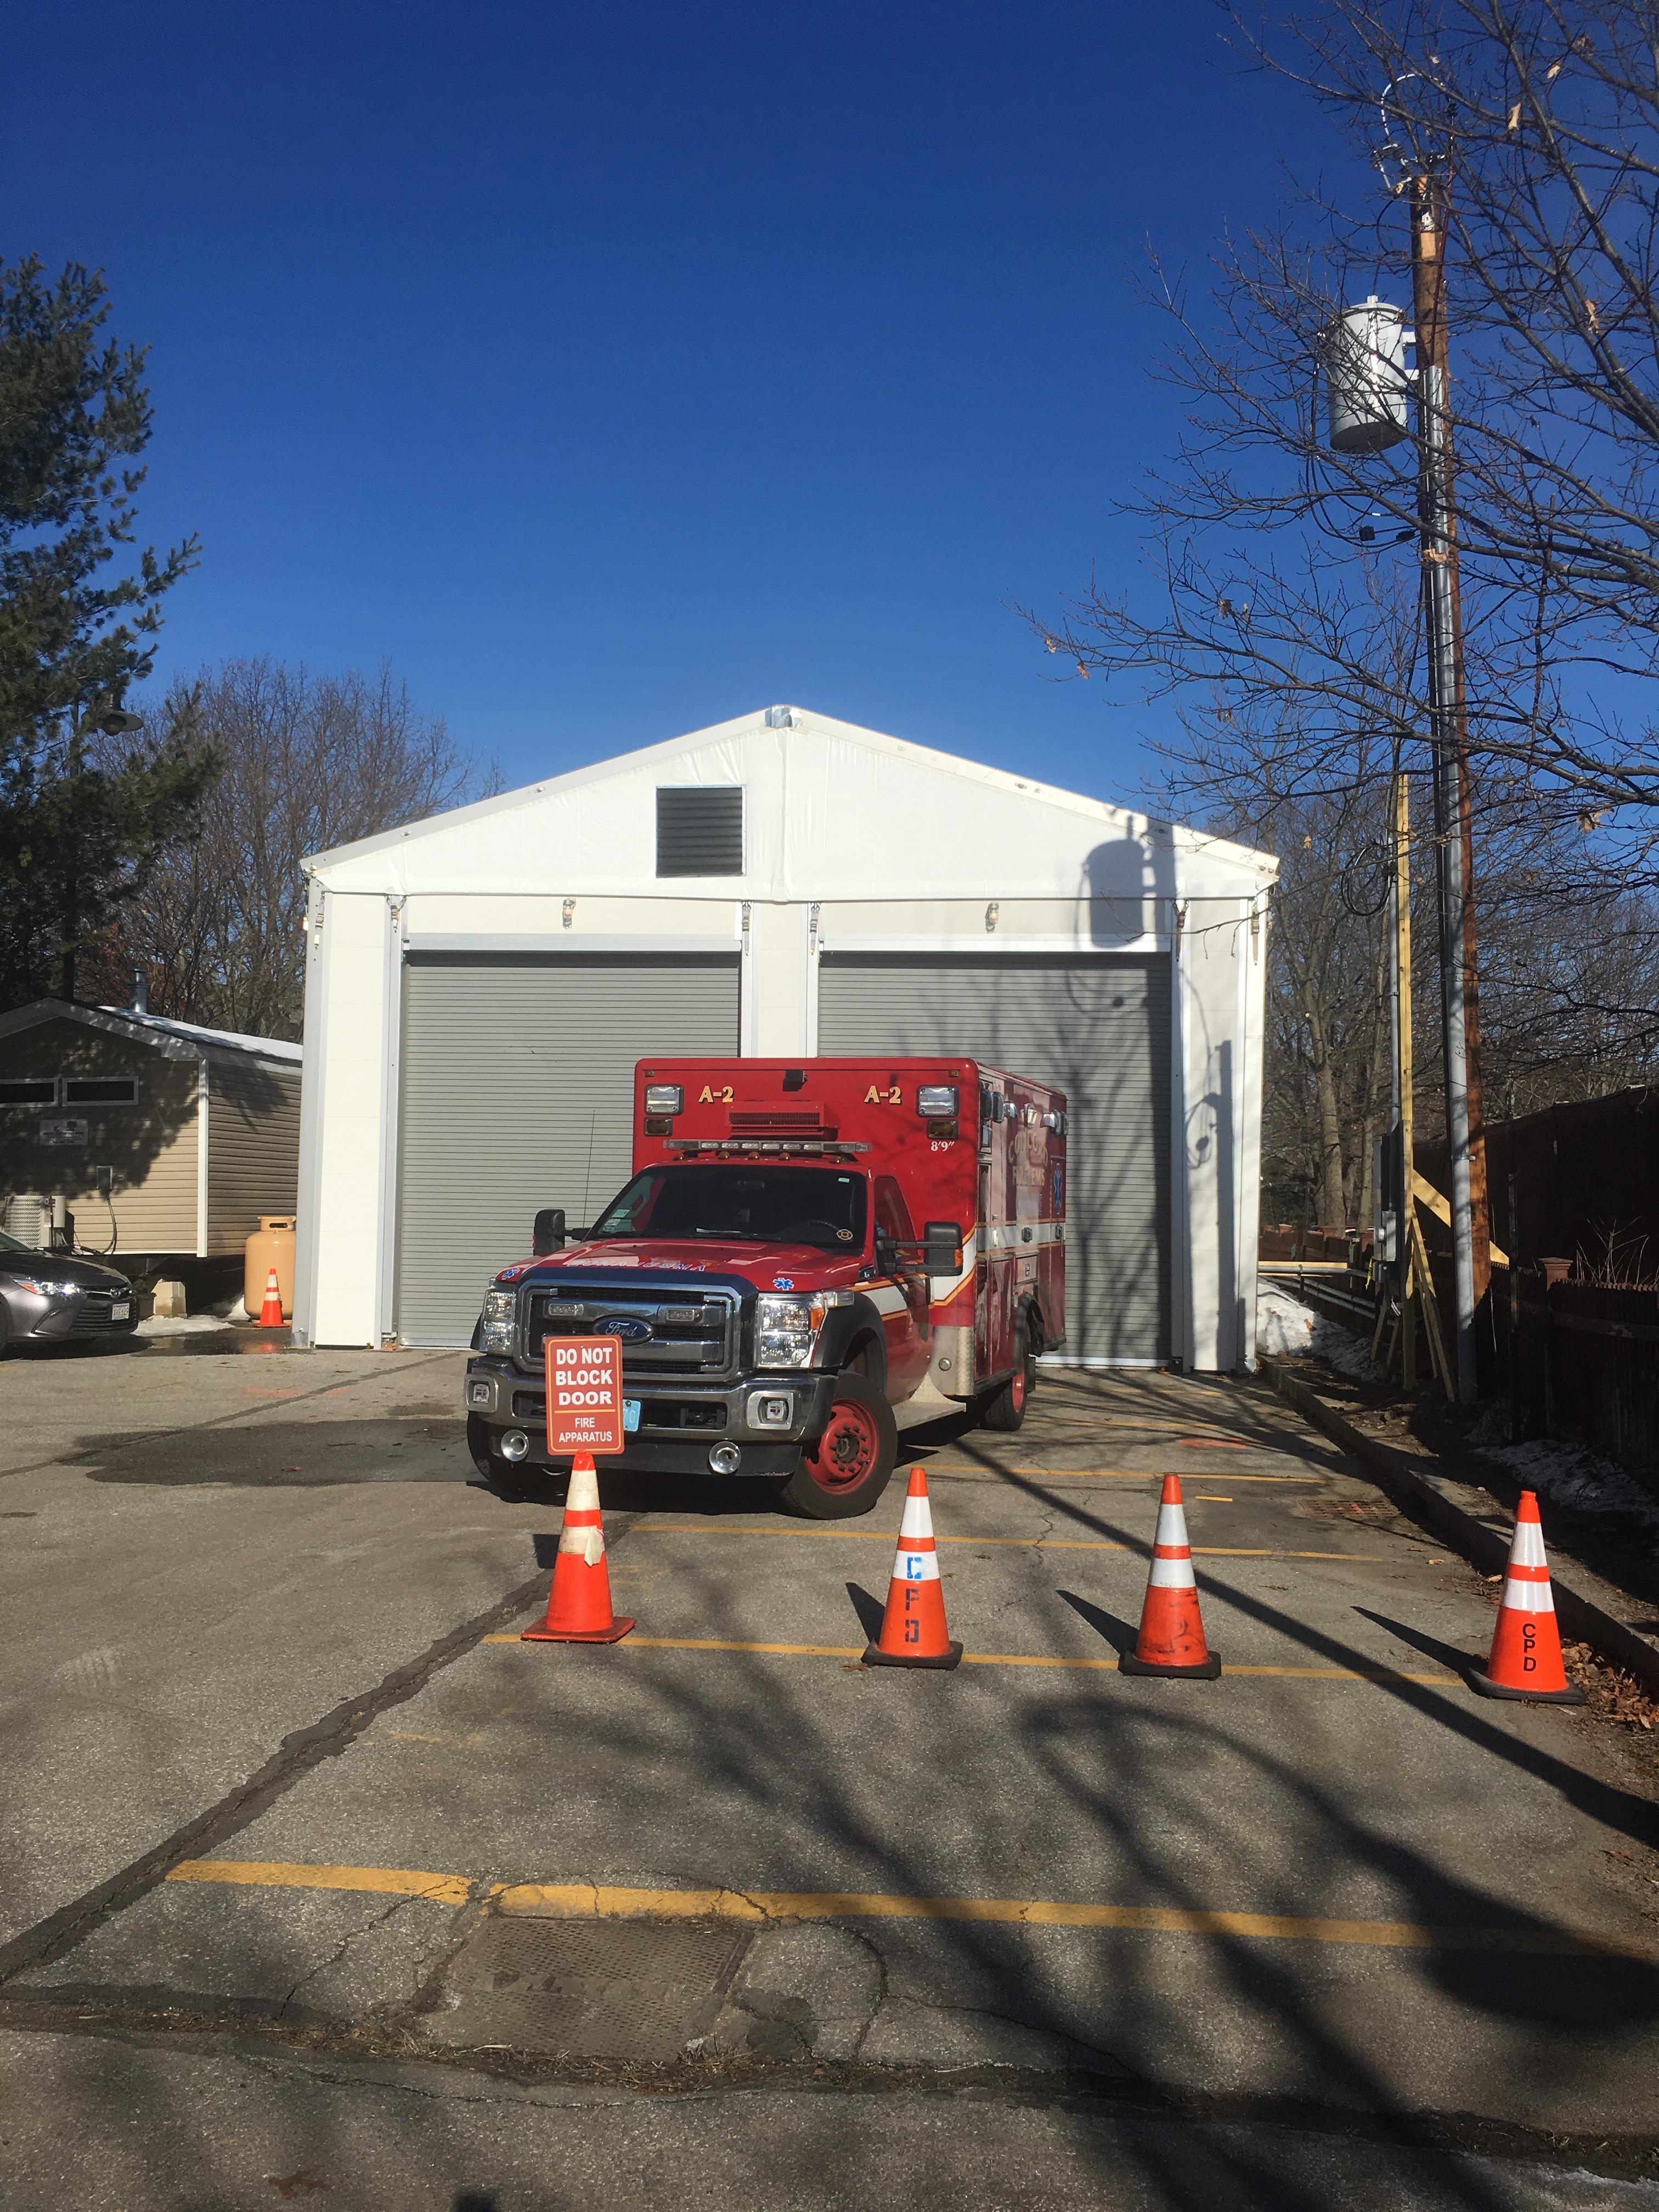 Temporary firehouse